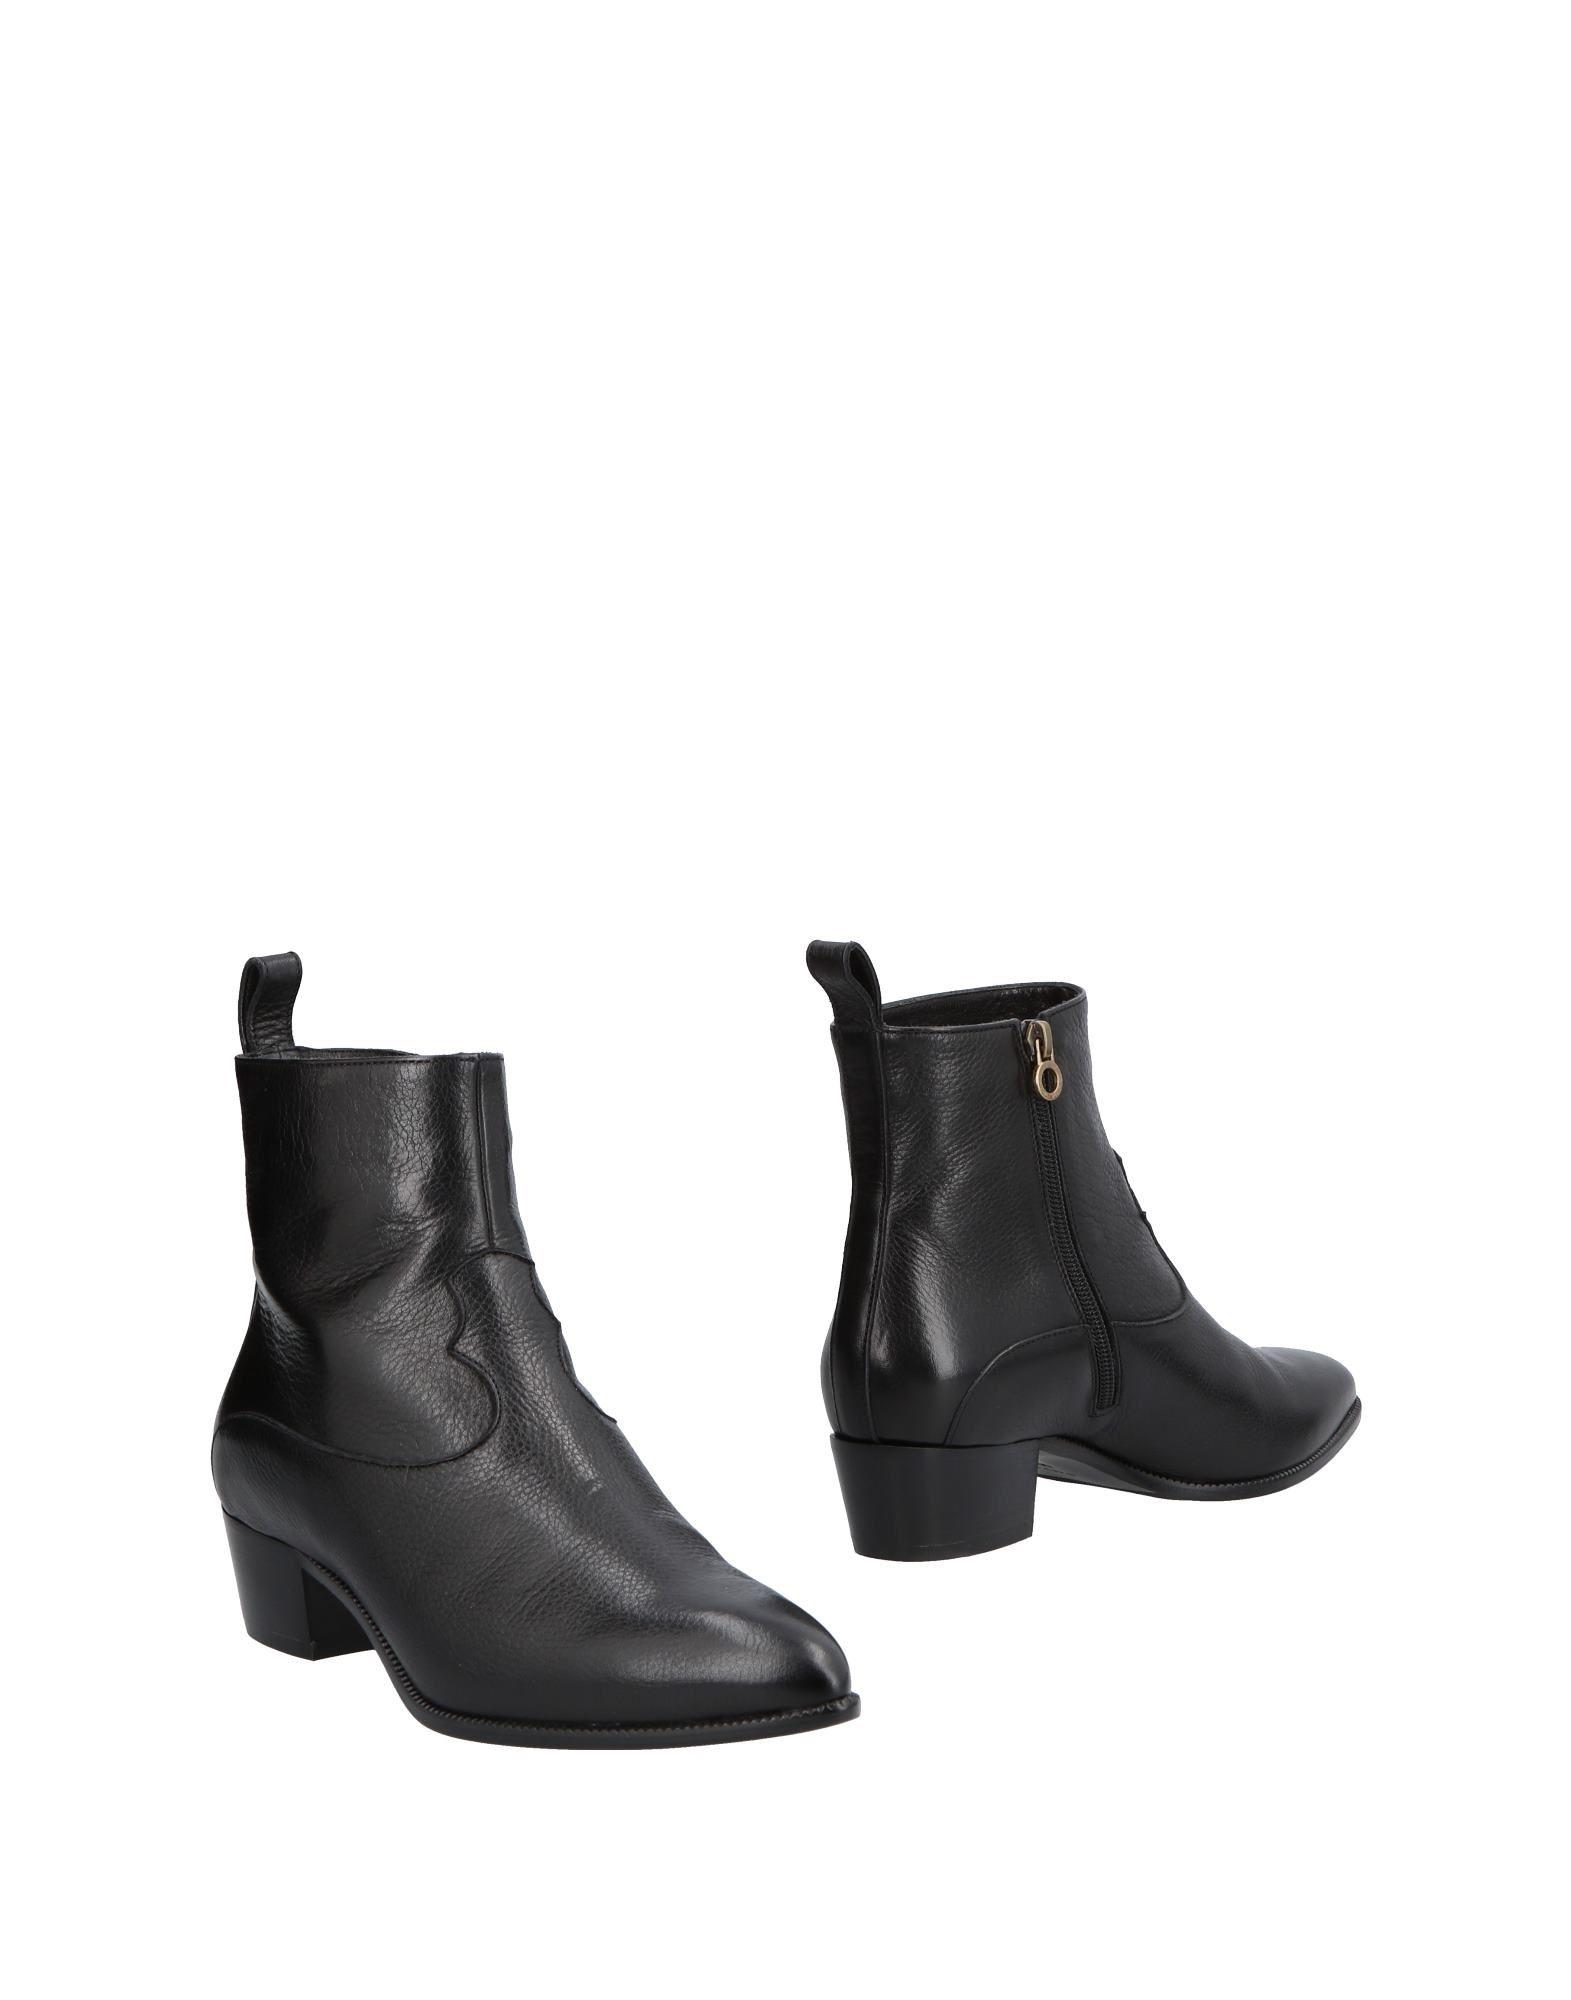 L' Autre Chose Stiefelette 11487367HF Damen  11487367HF Stiefelette Neue Schuhe 622e15